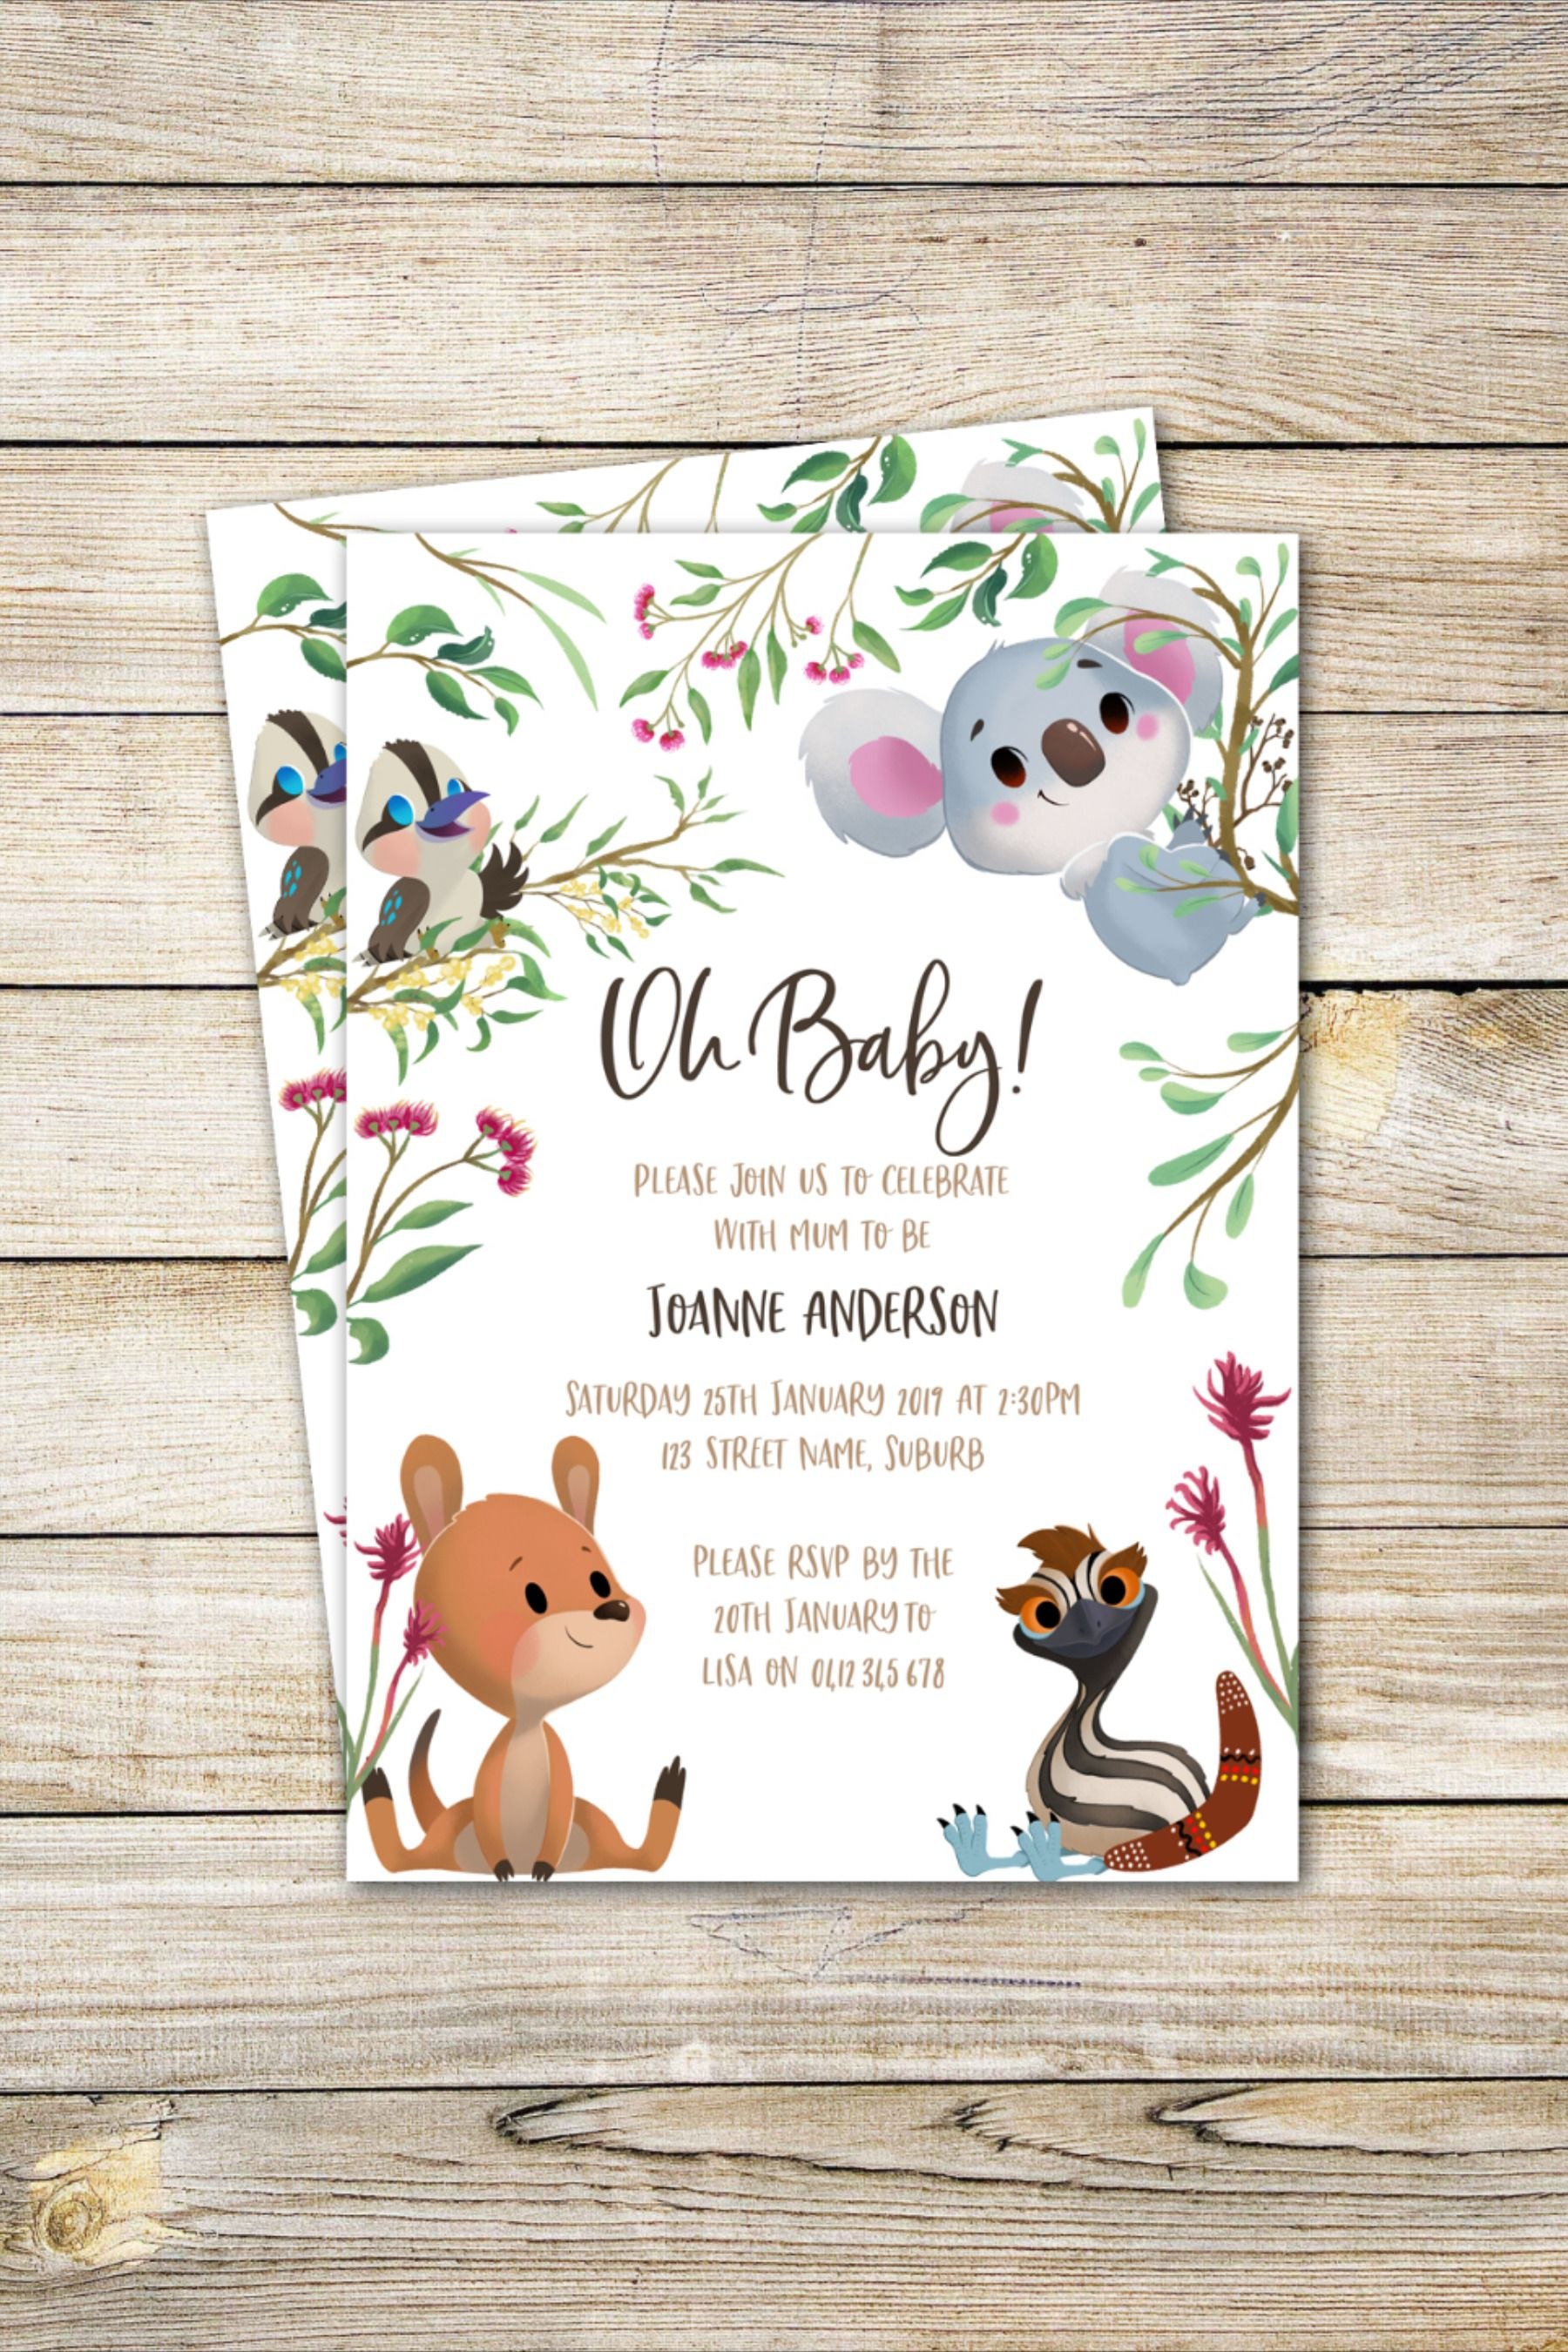 Baby Shower Invitation Australian Animal Theme Gender Neutral Native Anim Animal Baby Shower Invitations Animal Baby Shower Theme Baby Shower Invitations